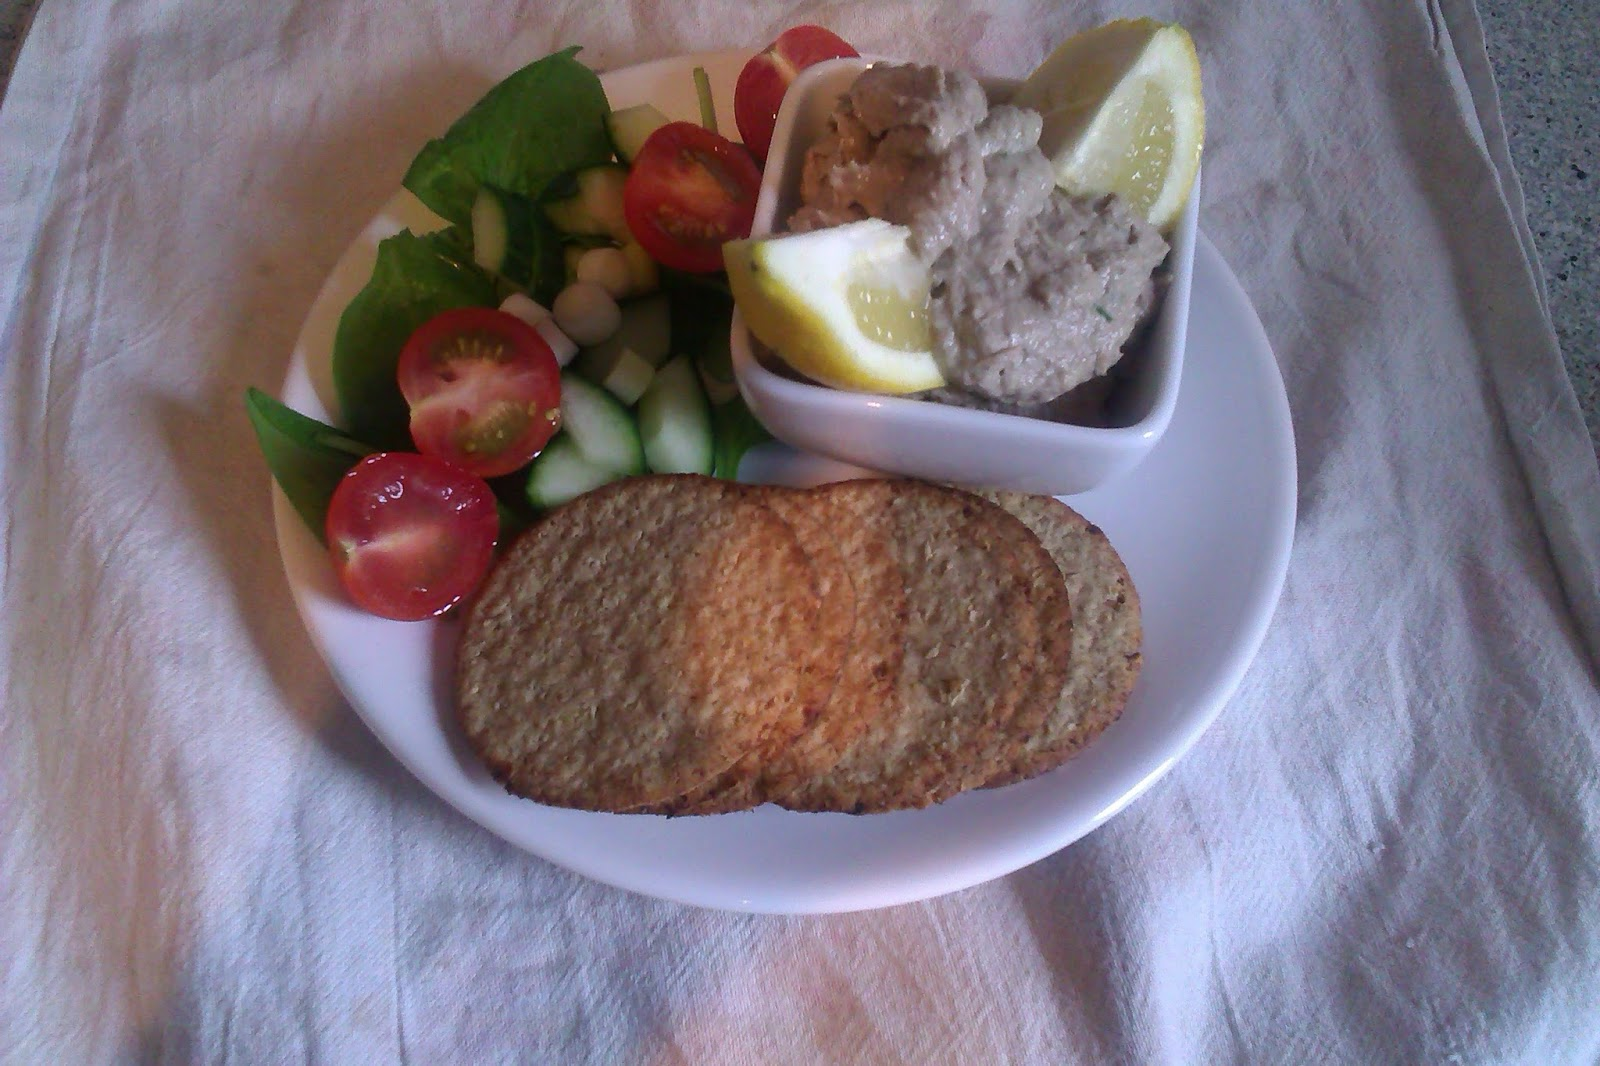 The Twilight Chef: Lemon and Sardine Pate